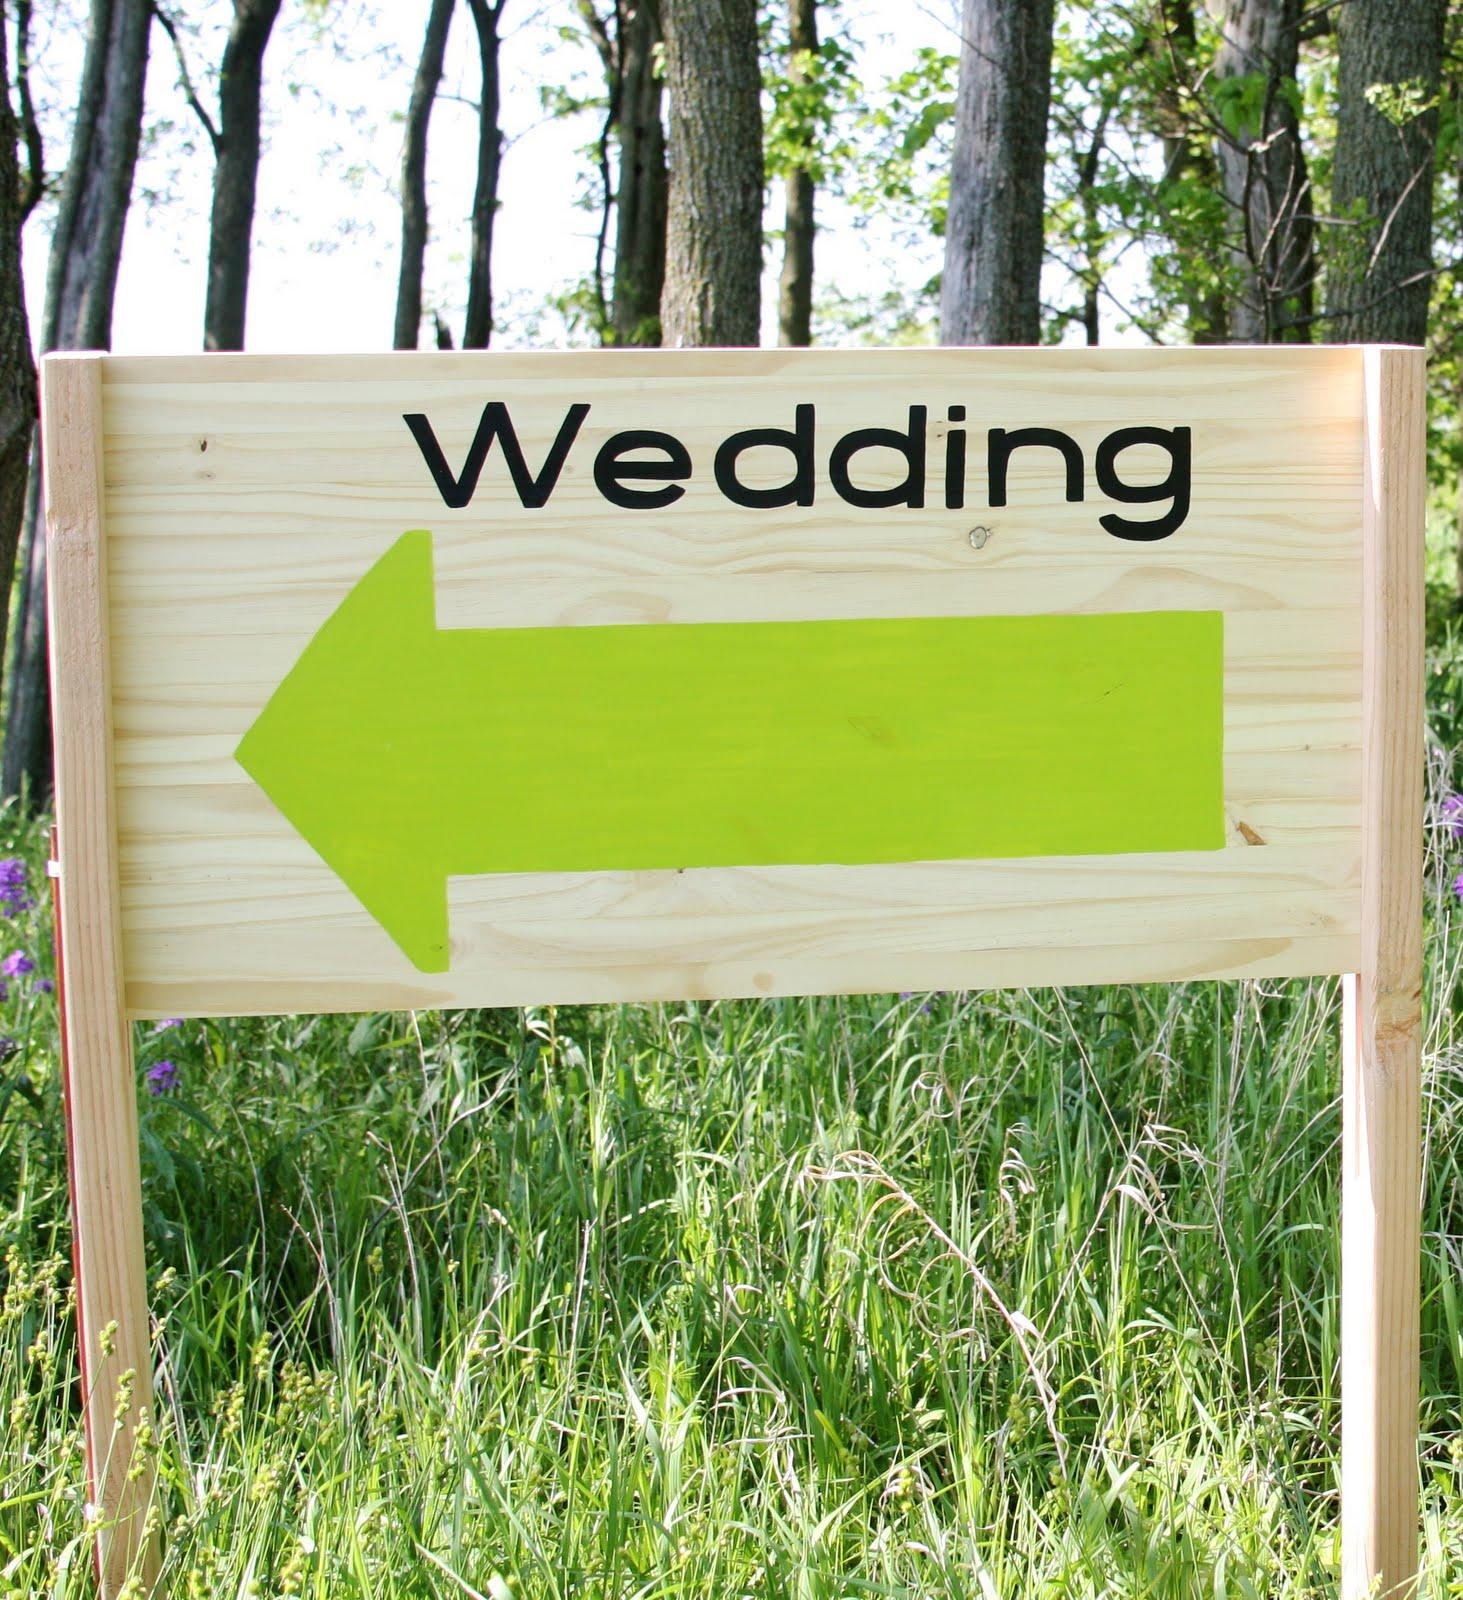 Leddie's Blog: Surya Jyothika Wedding